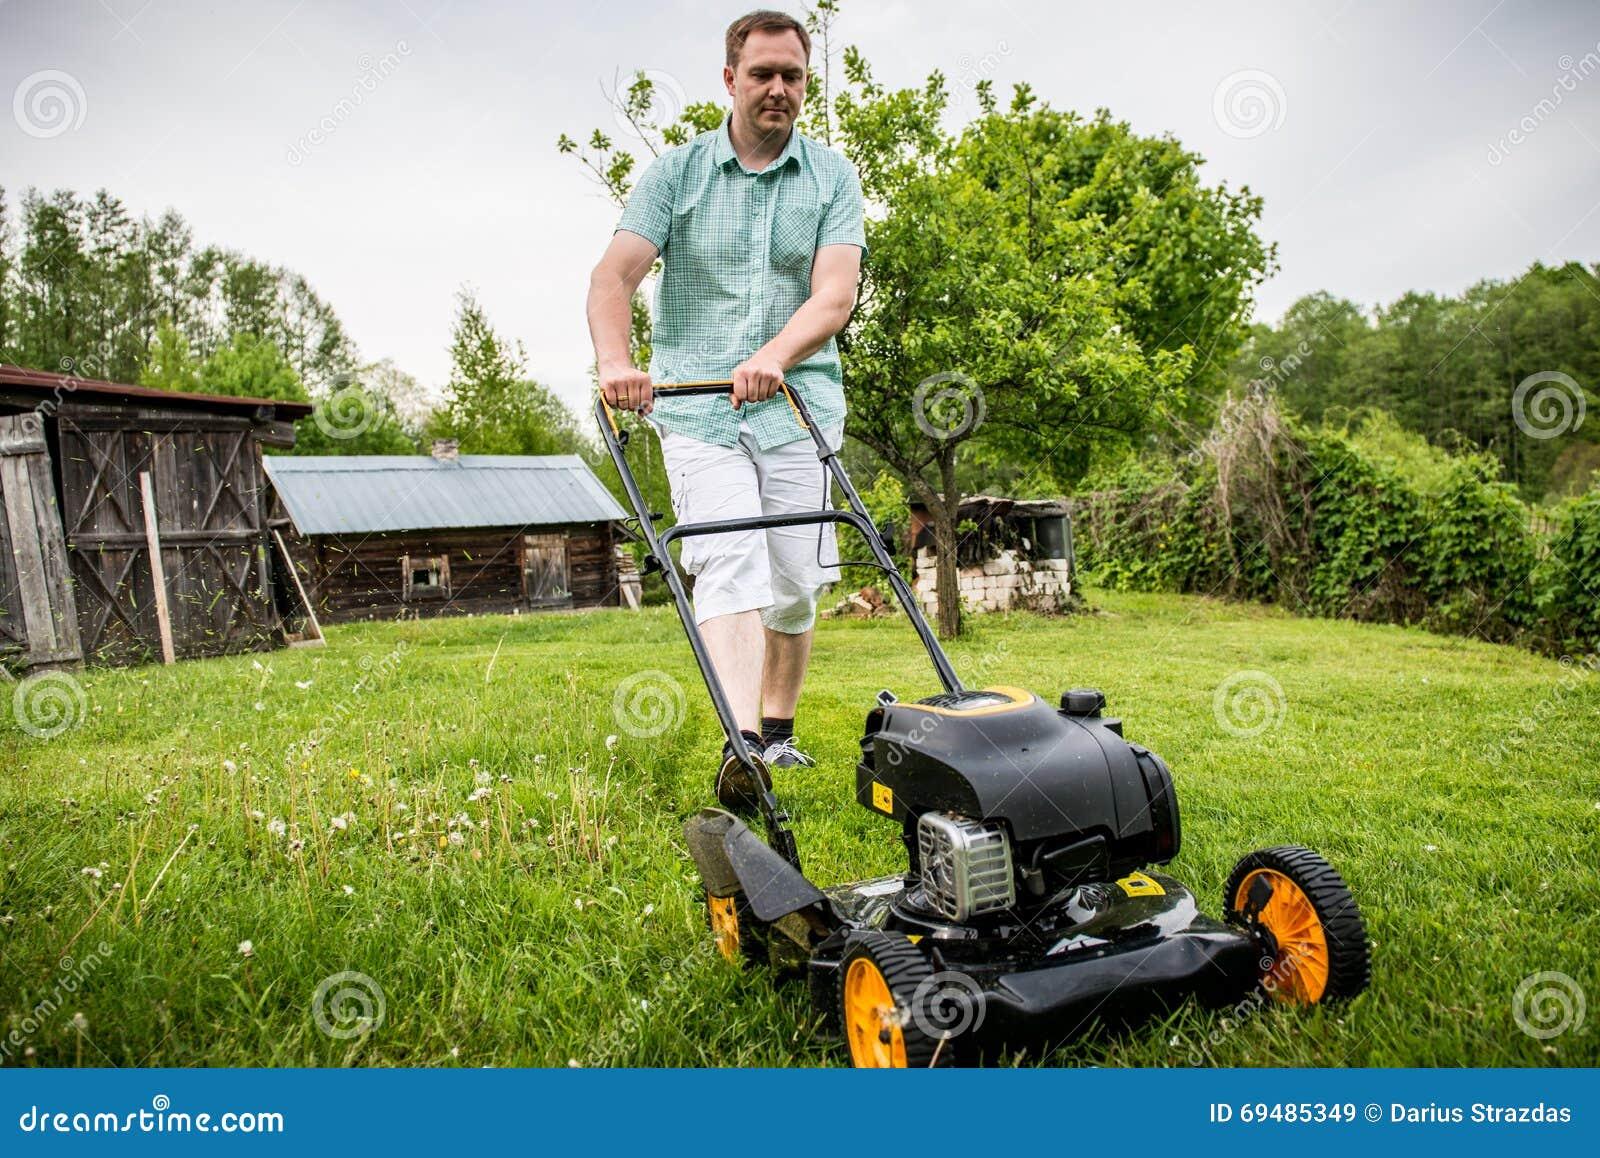 Man mowing lawn stock photo. Image of work, yard, garden